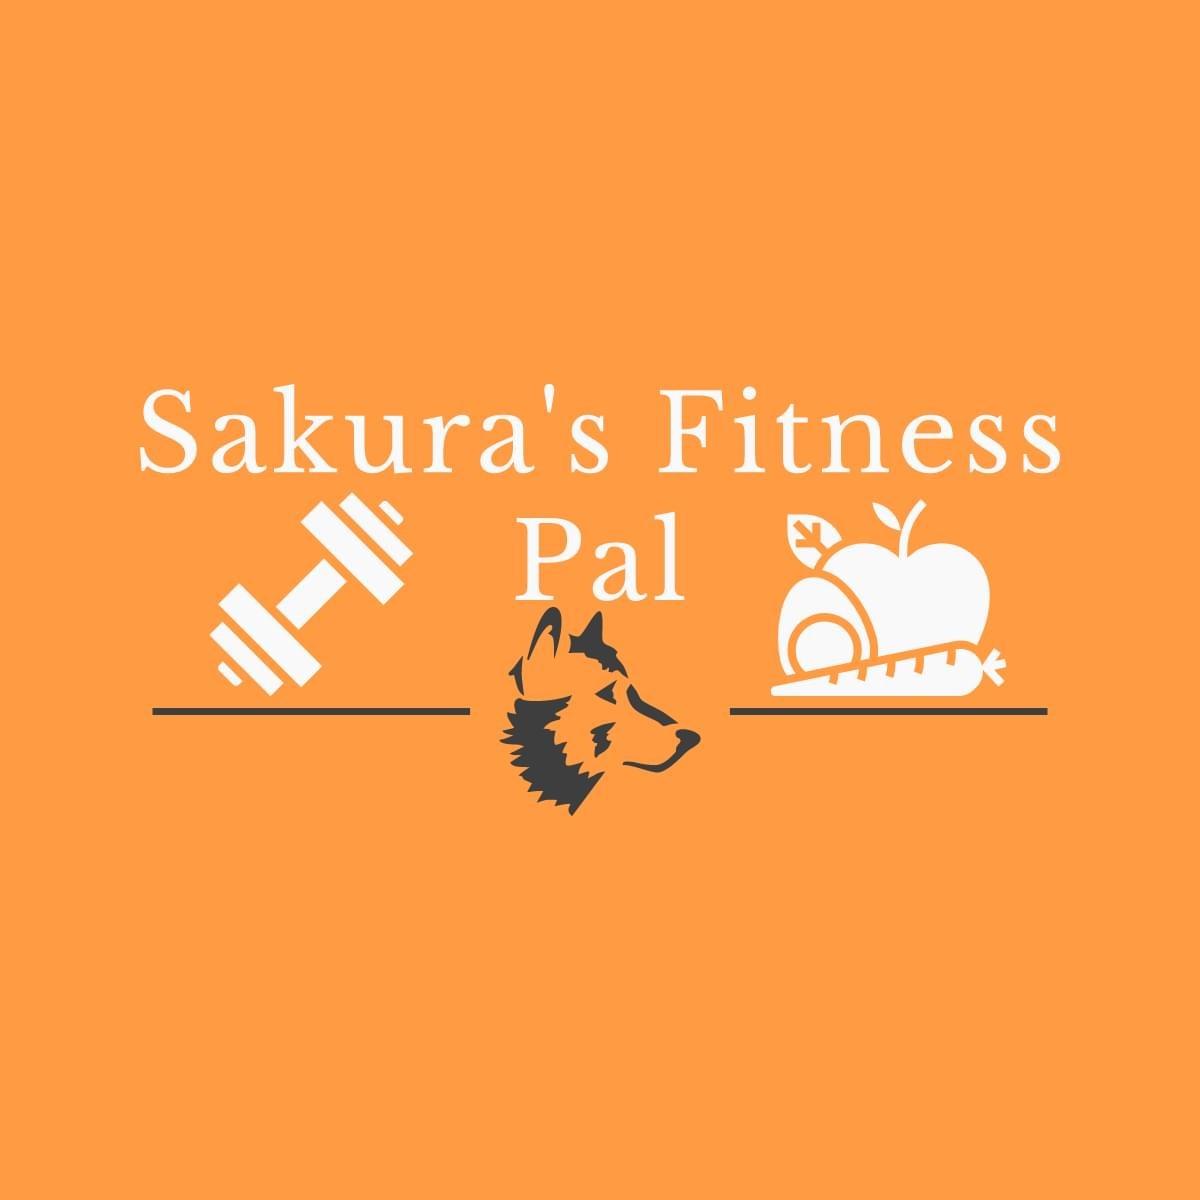 Sakura's Fitness Pal Logo